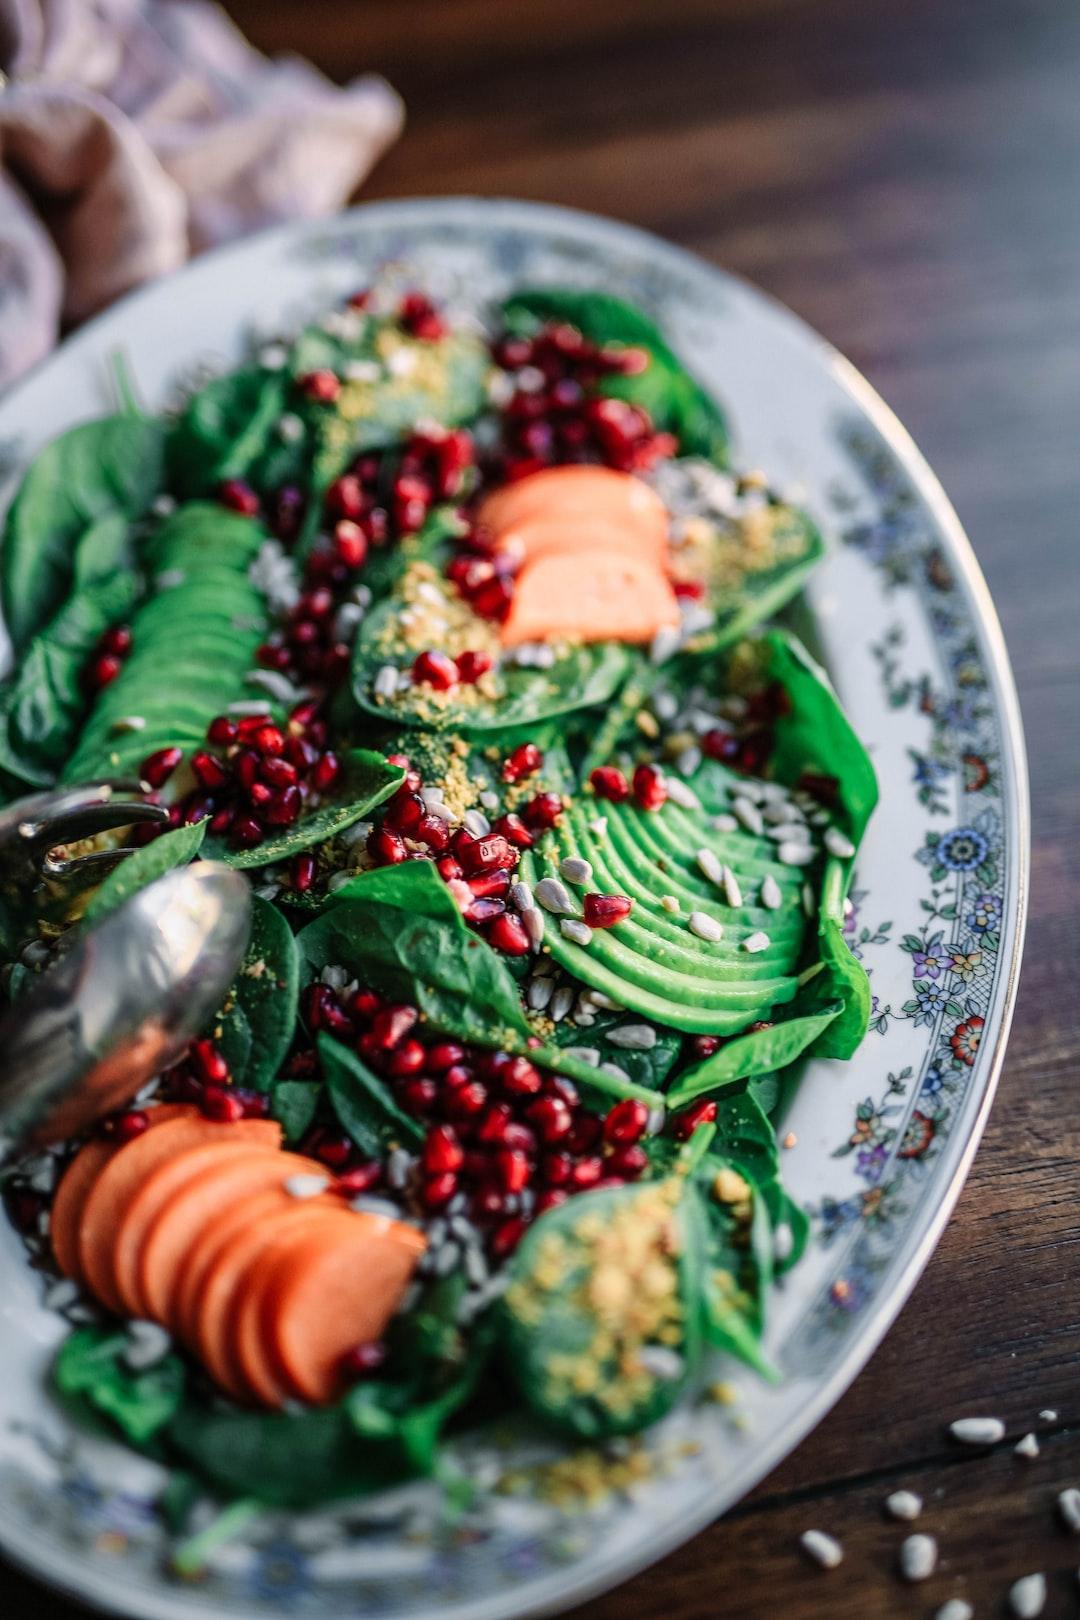 Fall salad photo by edgar castrejon edgarraw on unsplash for Verena hoflehner